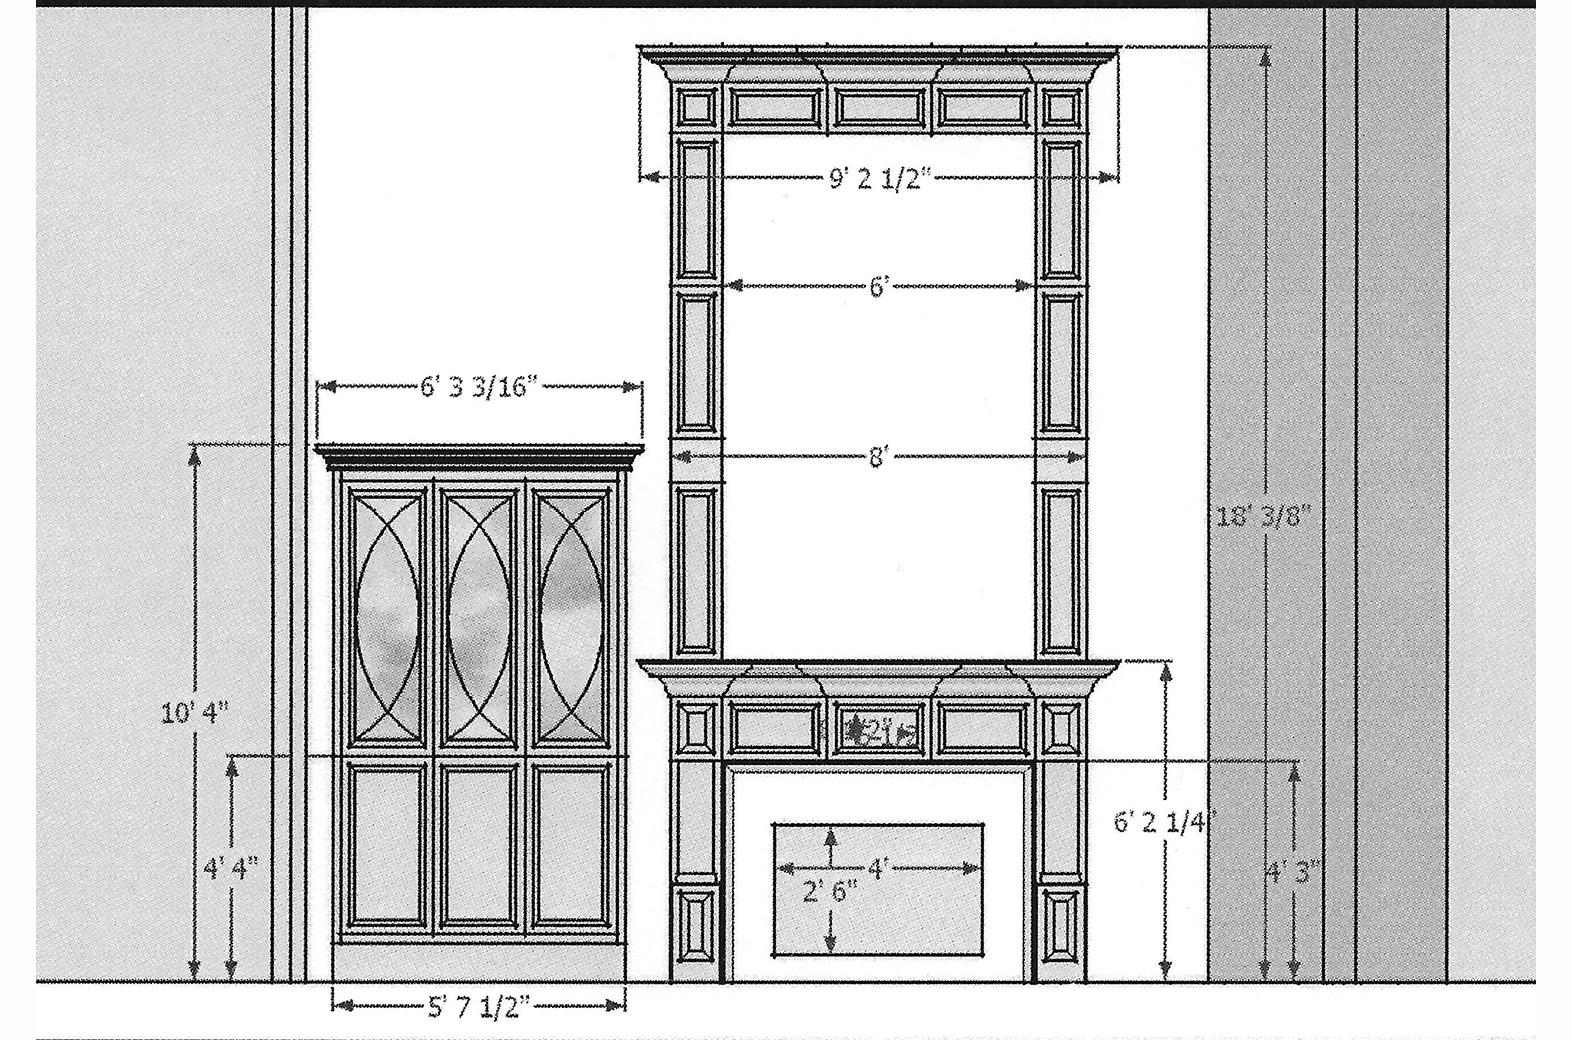 fireplace 600dpi edtied frame.jpg